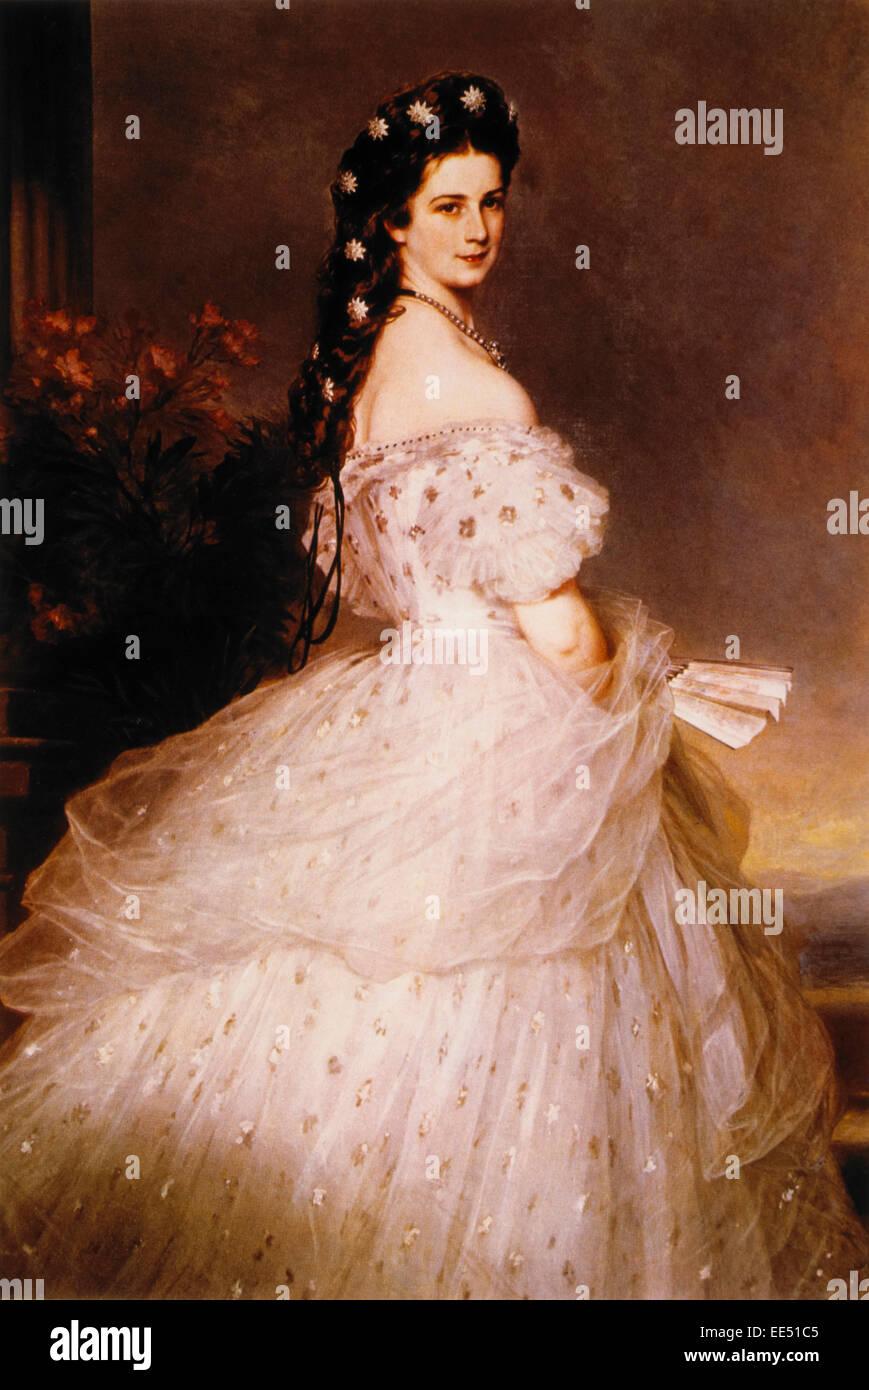 Kaiserin Elisabeth (Empress Elisabeth of Austria), Painting by Franz Xavier Winterhalter, 1865 - Stock Image